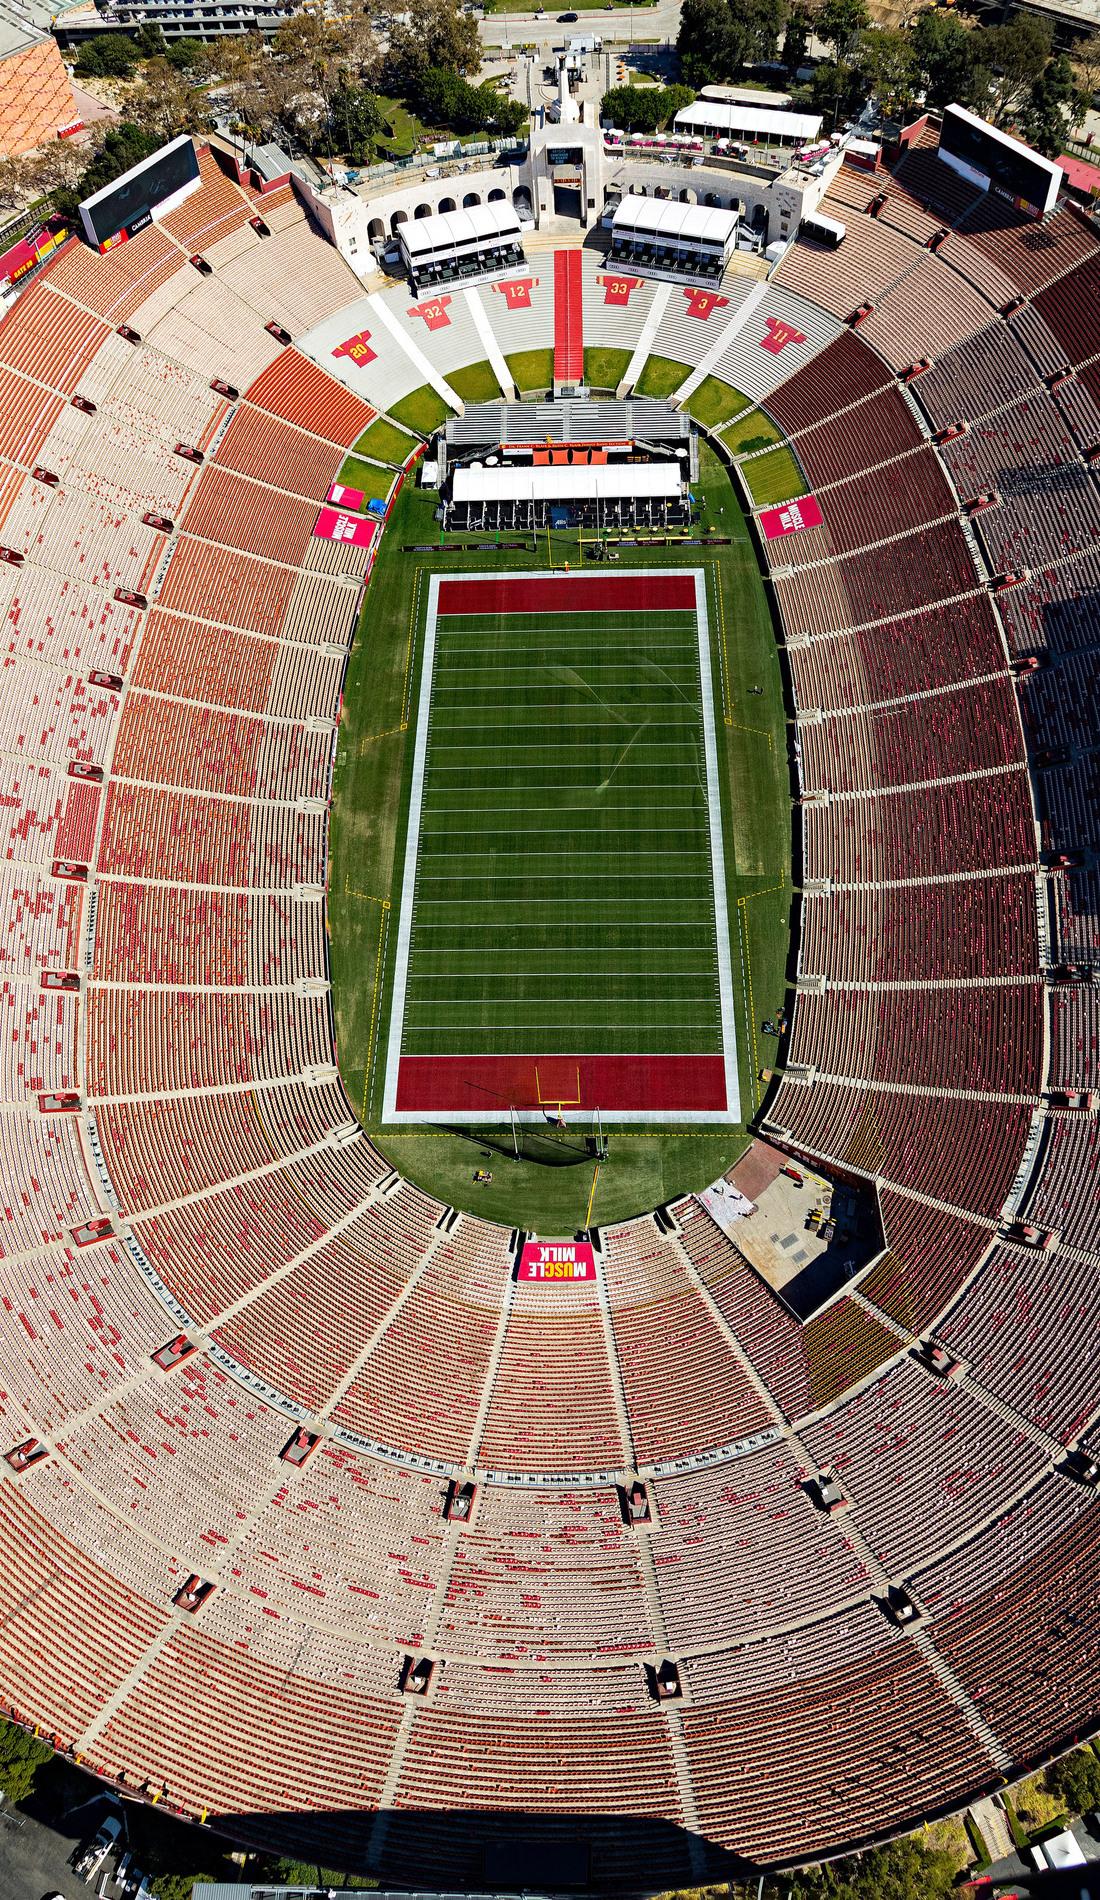 A USC Trojans Football live event